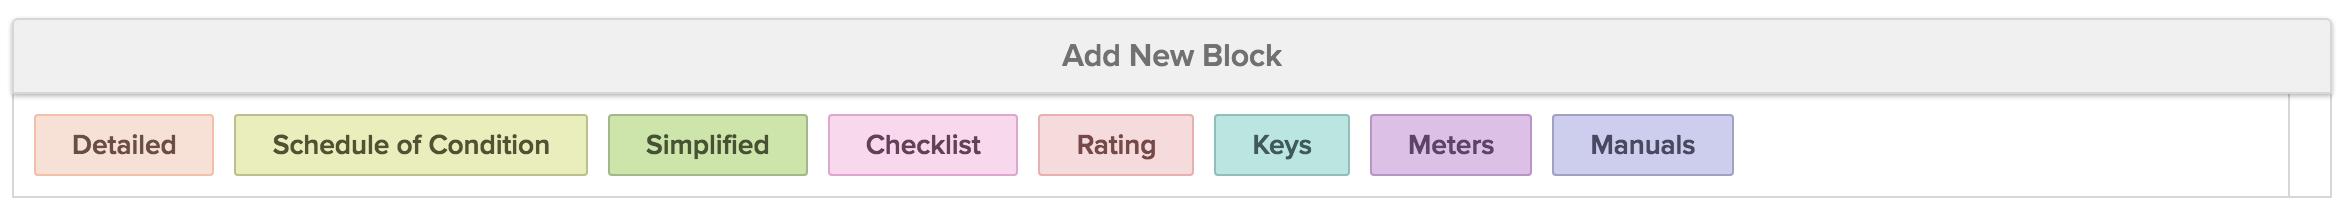 Block/Format Types